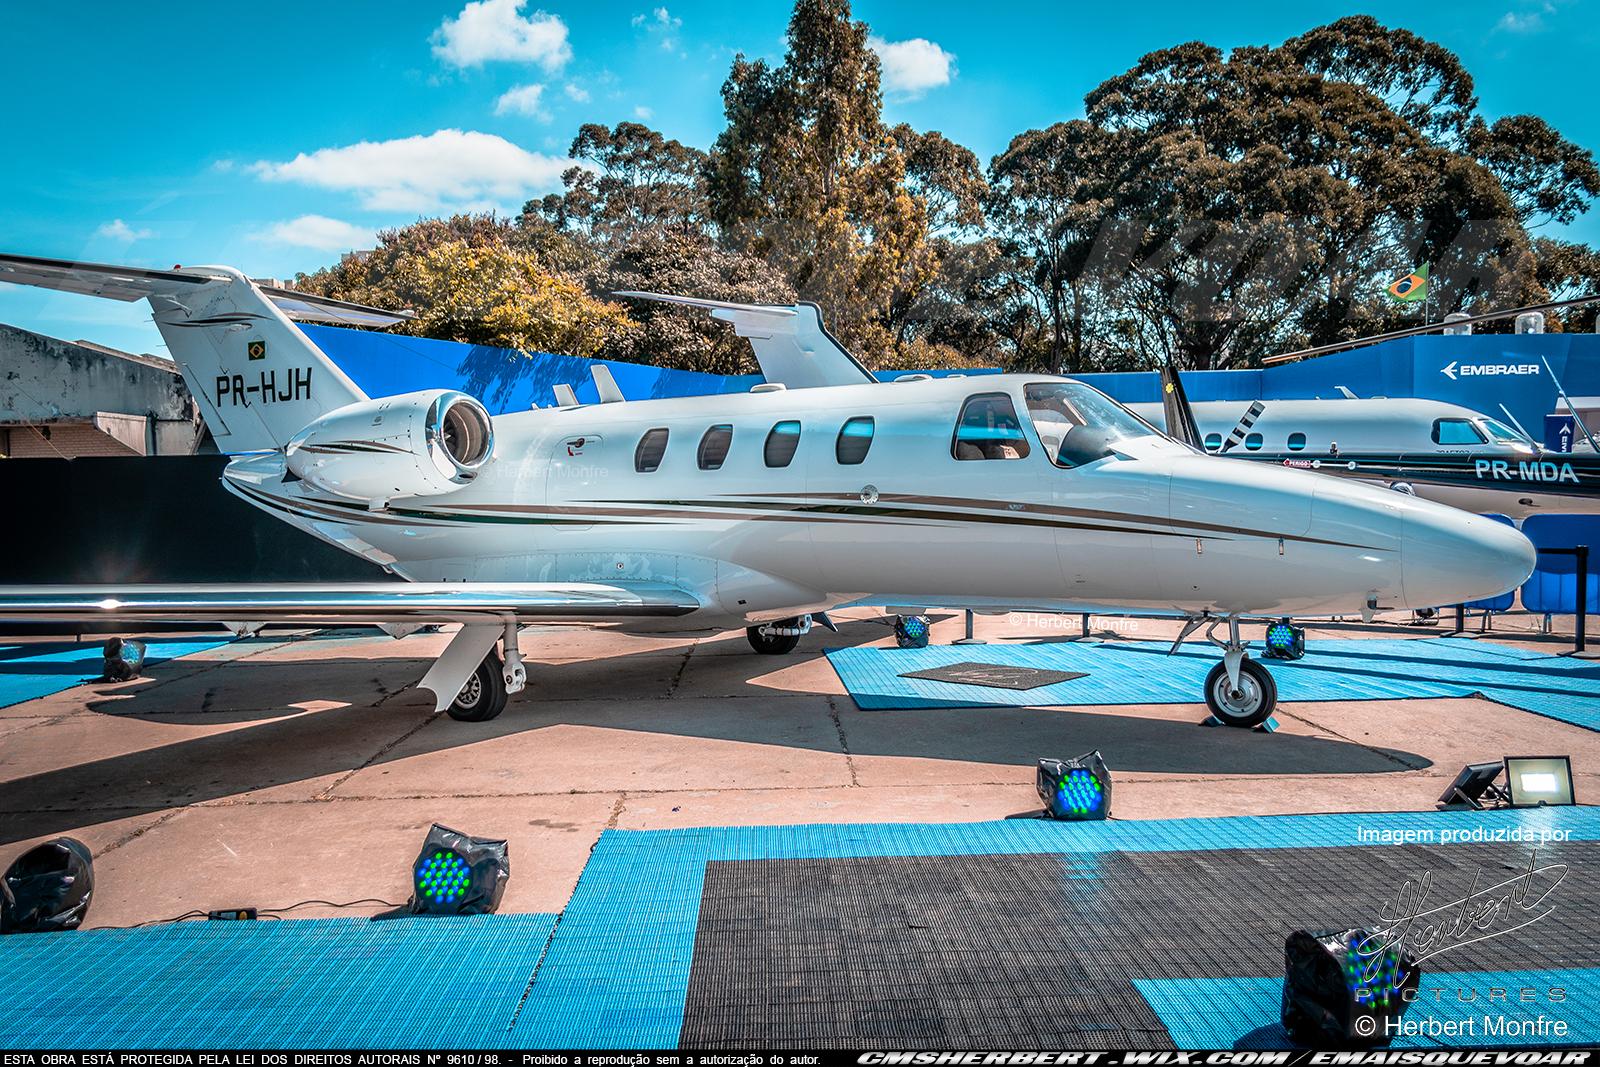 Cessna Citation M2 | PR-HJH | Foto © Herbert Monfre - Contrate o fotógrafo em cmsherbert@hotmail.com | by É MAIS QUE VOAR | LABACE 2019